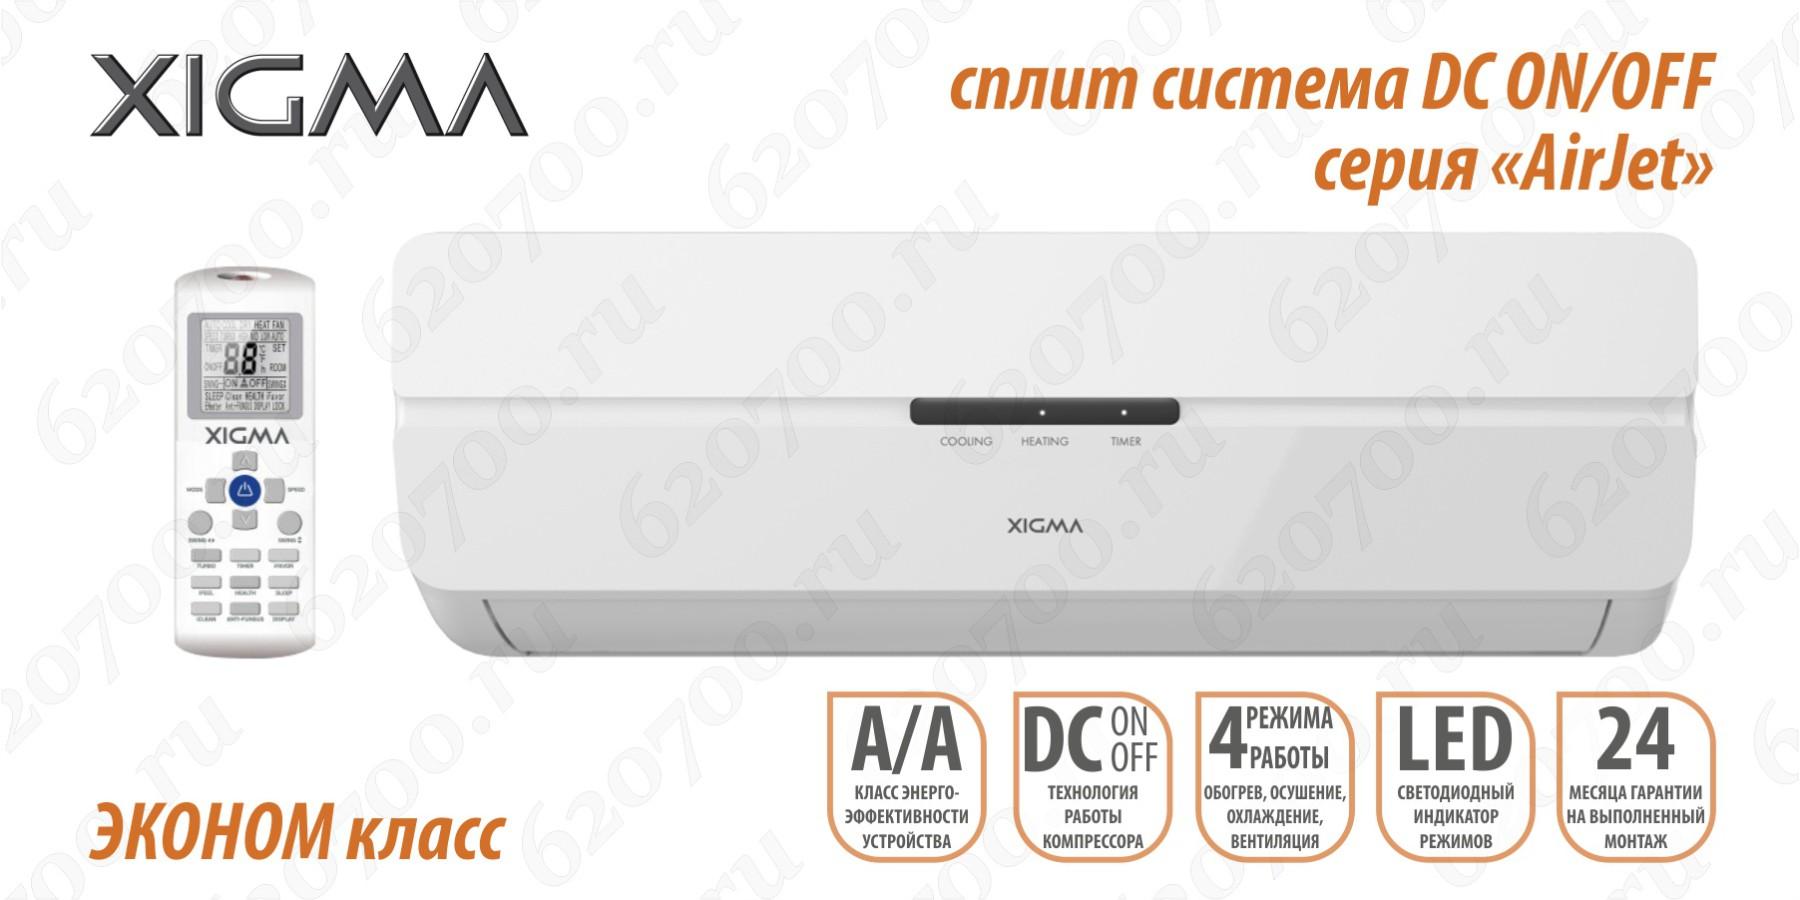 Кондиционер XIGMA XG-AJ37RHA-IDU/ ODU